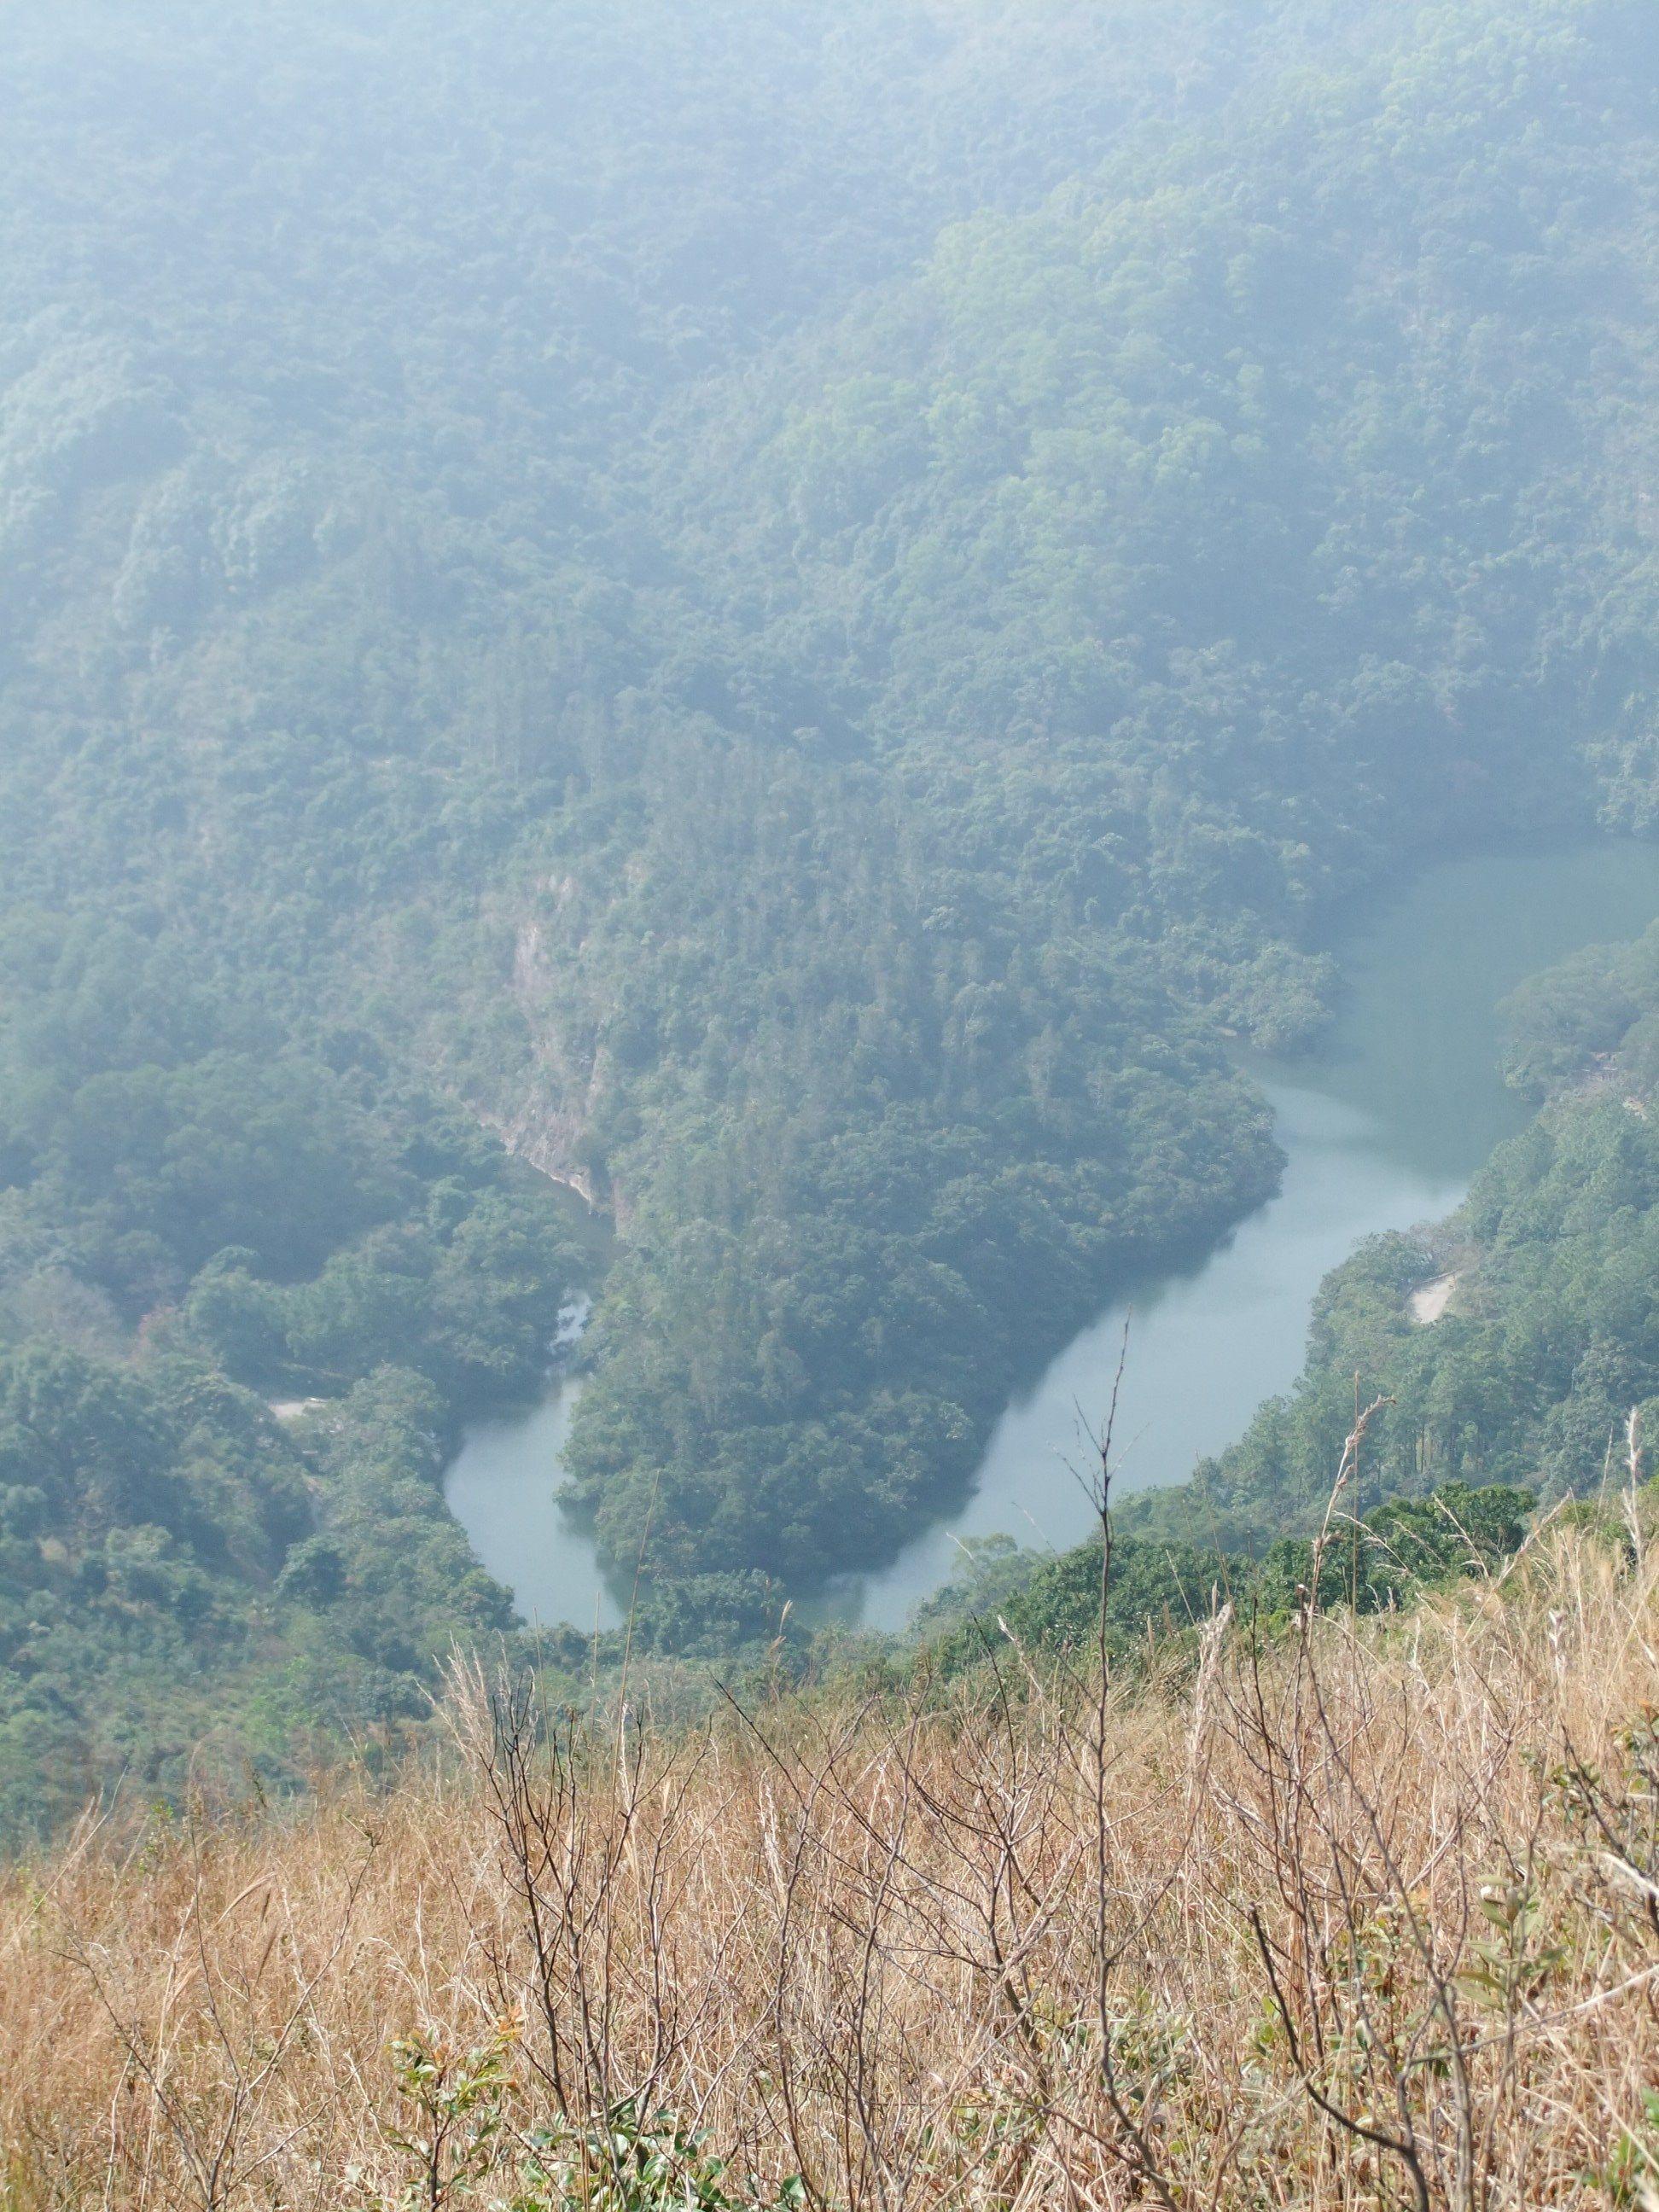 Hike in Autumn - near Hok Tau Lau Shui Heung in New Territories